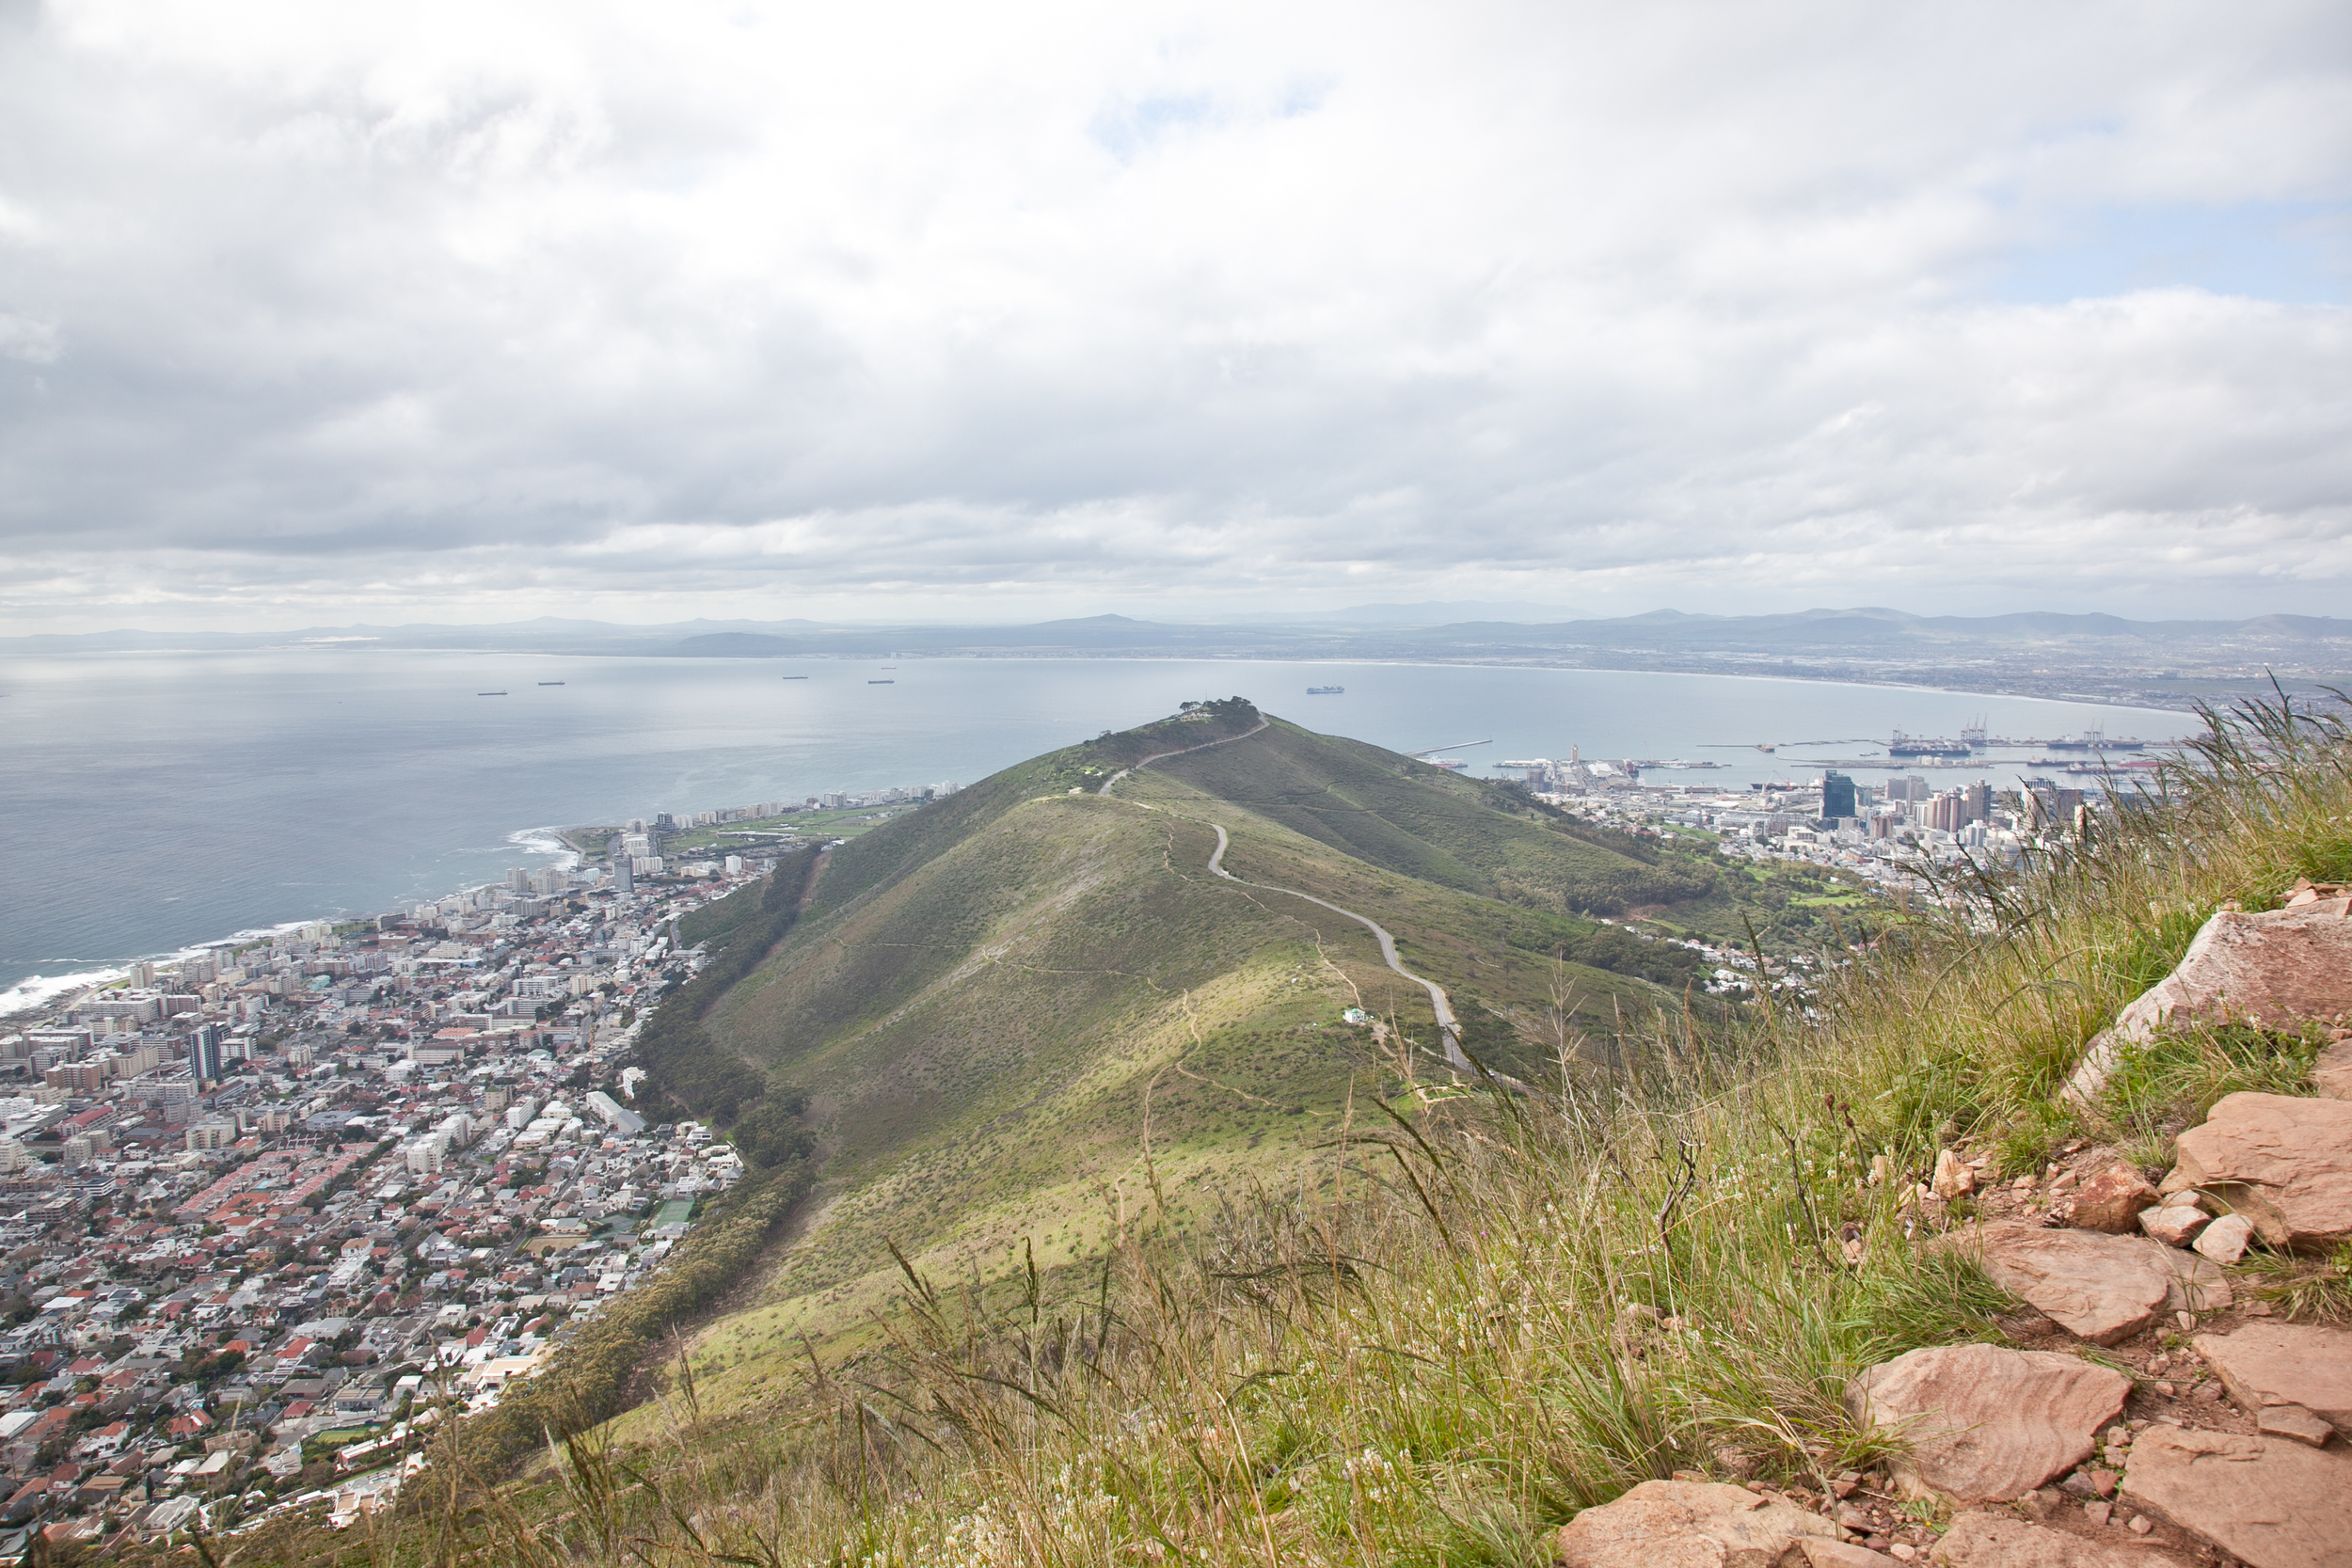 IMG_5036-hiking-lions-head-cape-town-trisa-taro.jpg